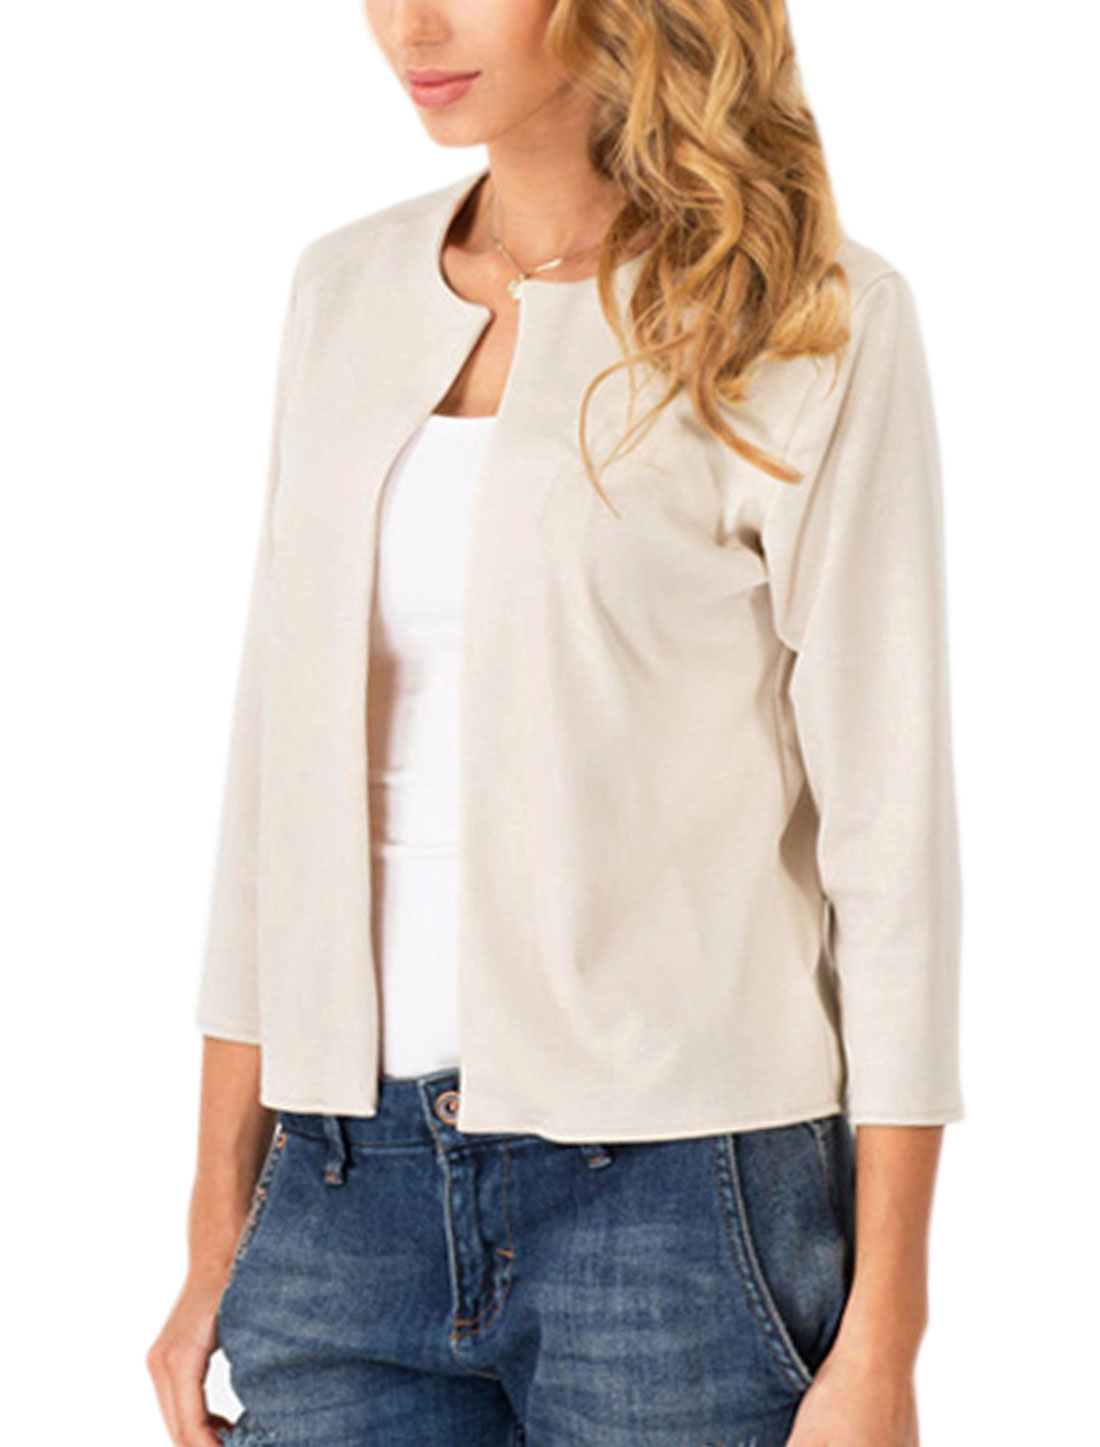 Women 3/4 Sleeve Round Neck Buttonless Leisure Cardigan Off White S